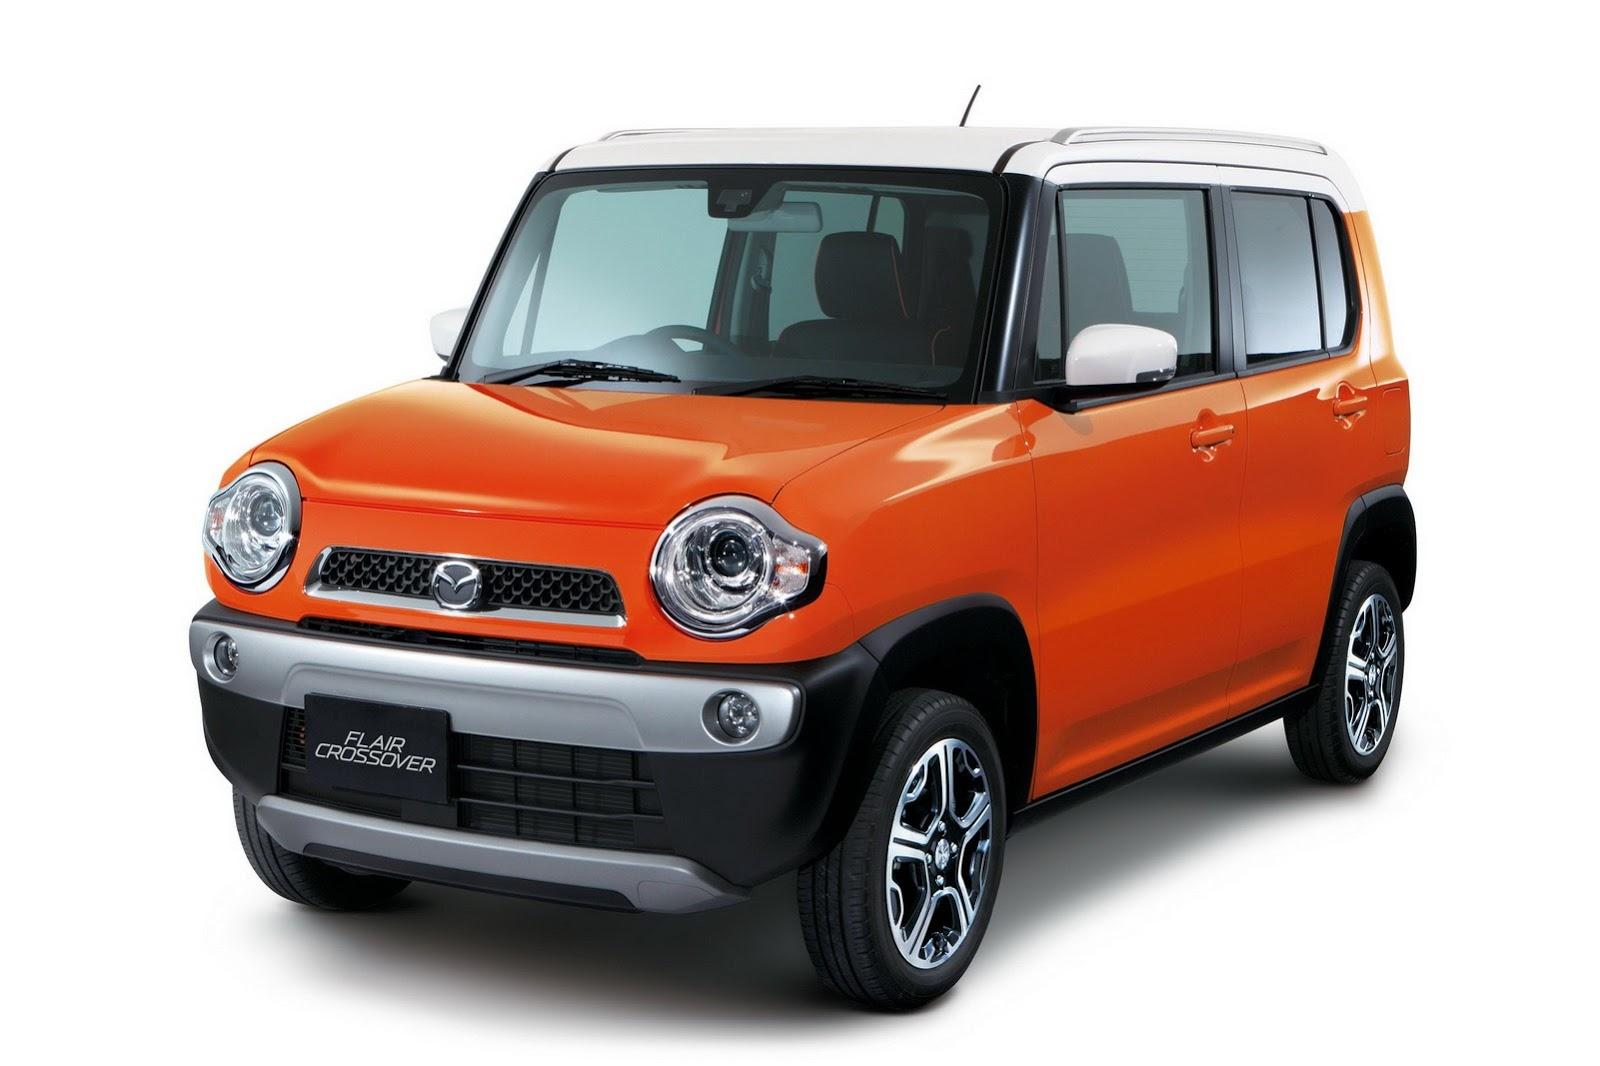 2014 - [Mazda/Suzuki] Flair Crossover / Hustler Mazda-Flair-Crossover-1%25255B3%25255D